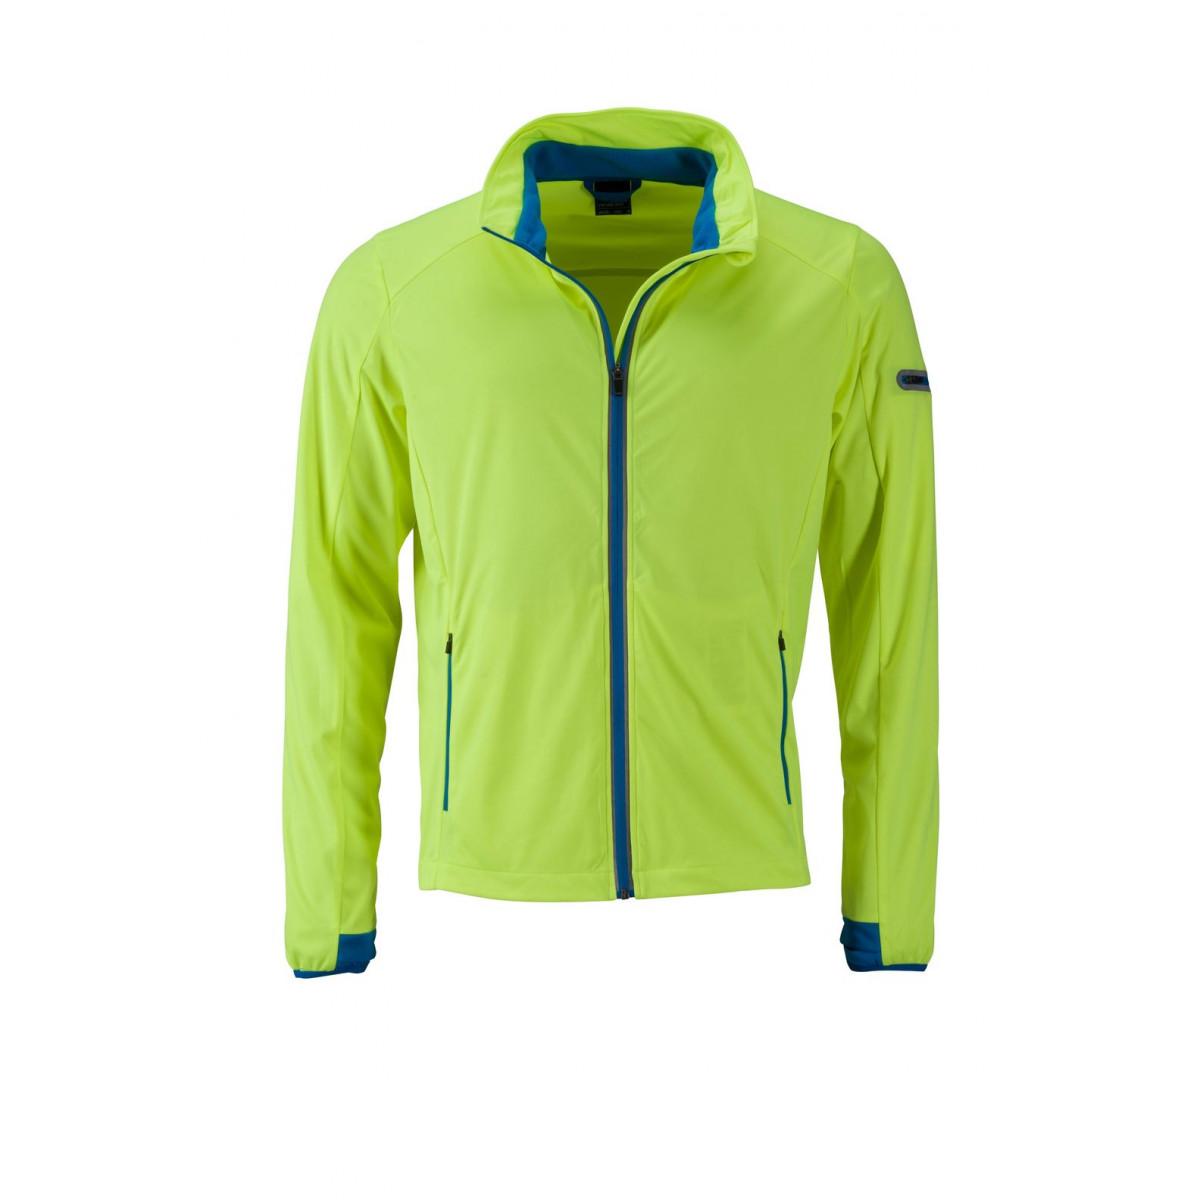 Куртка мужская JN1126 Mens Sports Softshell Jacket - Ярко-желтый/Ярко-синий